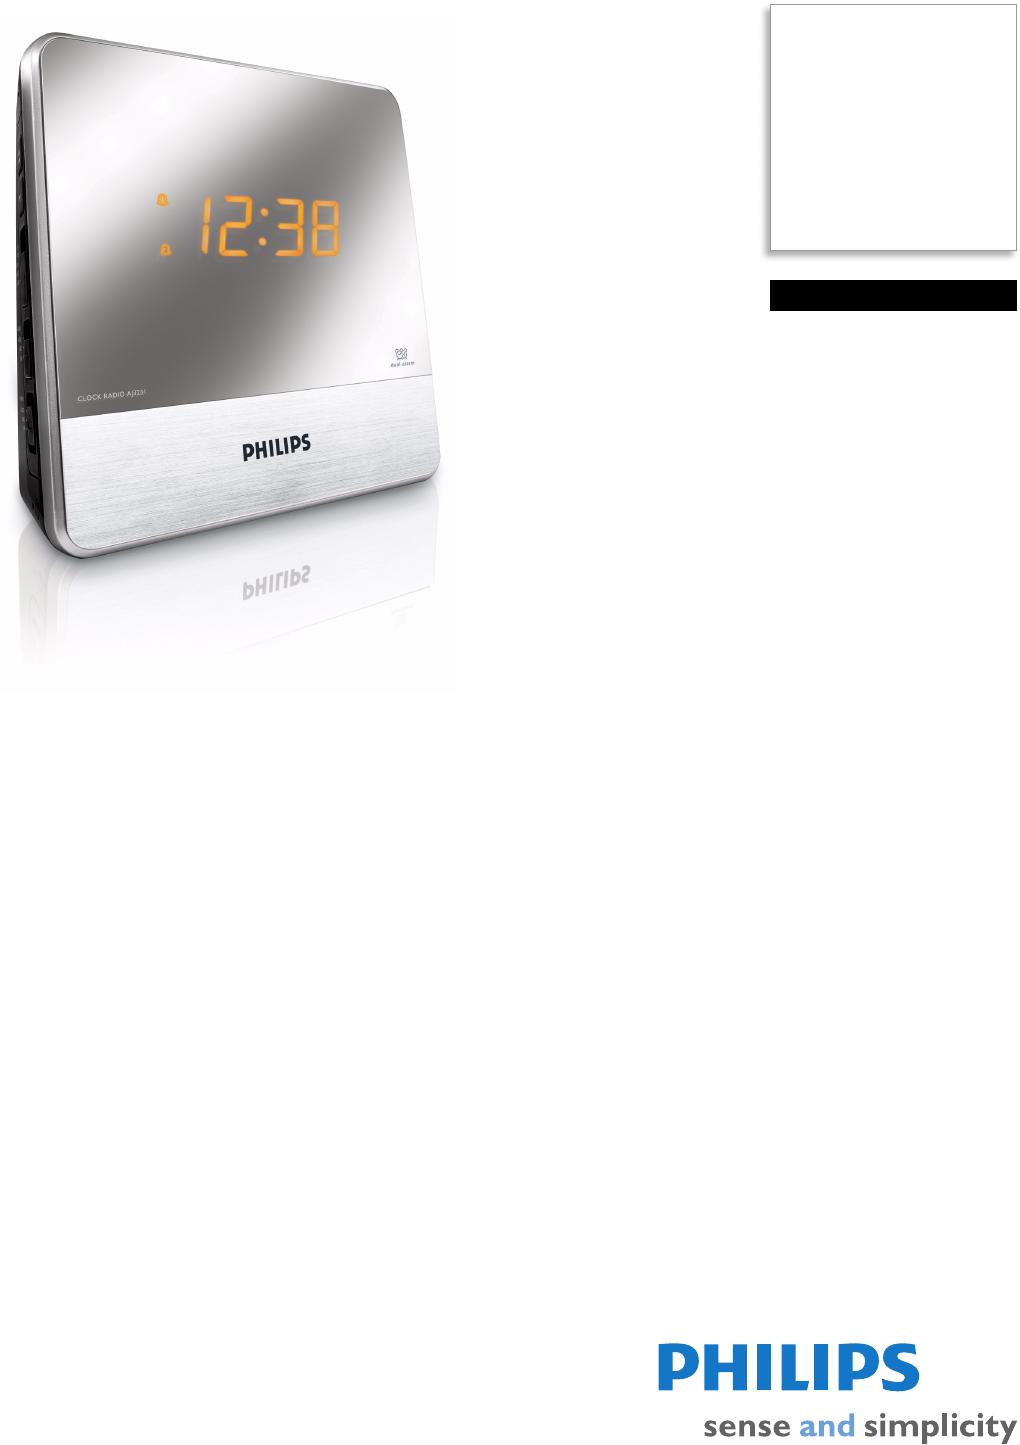 philips aj3231 37 clock radio user manual leaflet aj3231 37 pss aenca rh usermanual wiki NFC Philips Clock Radio Manual philips aj3231 alarm clock radio manual